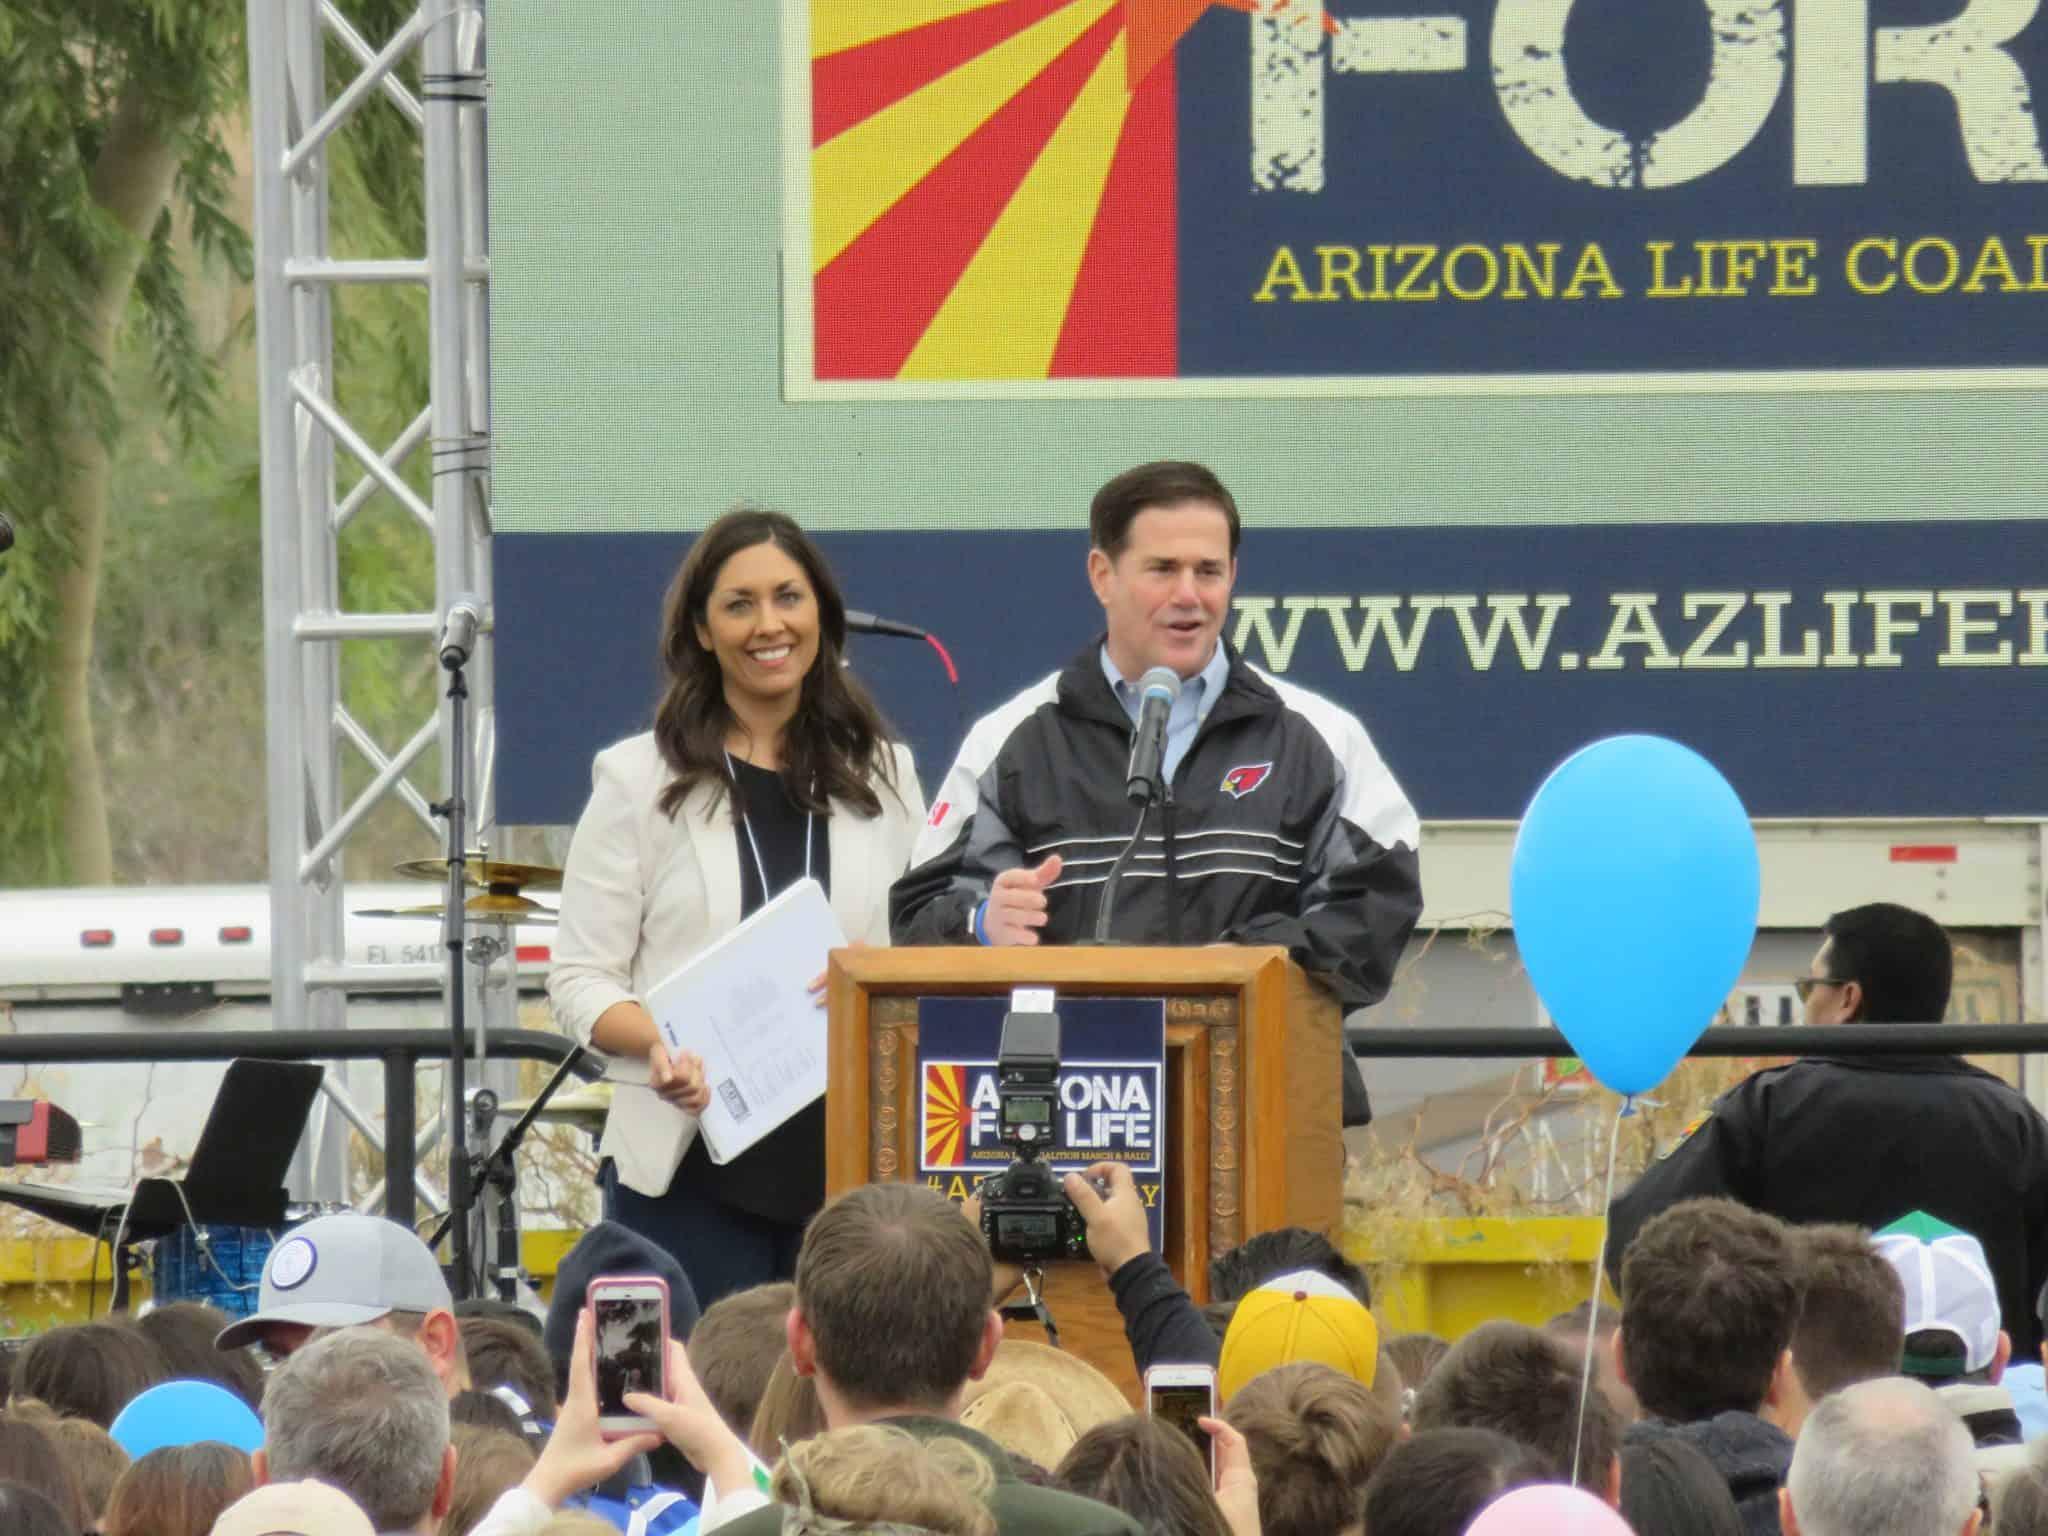 Elisa-Gov-Ducey 2018 Arizona for Life March & Rally - Thank You